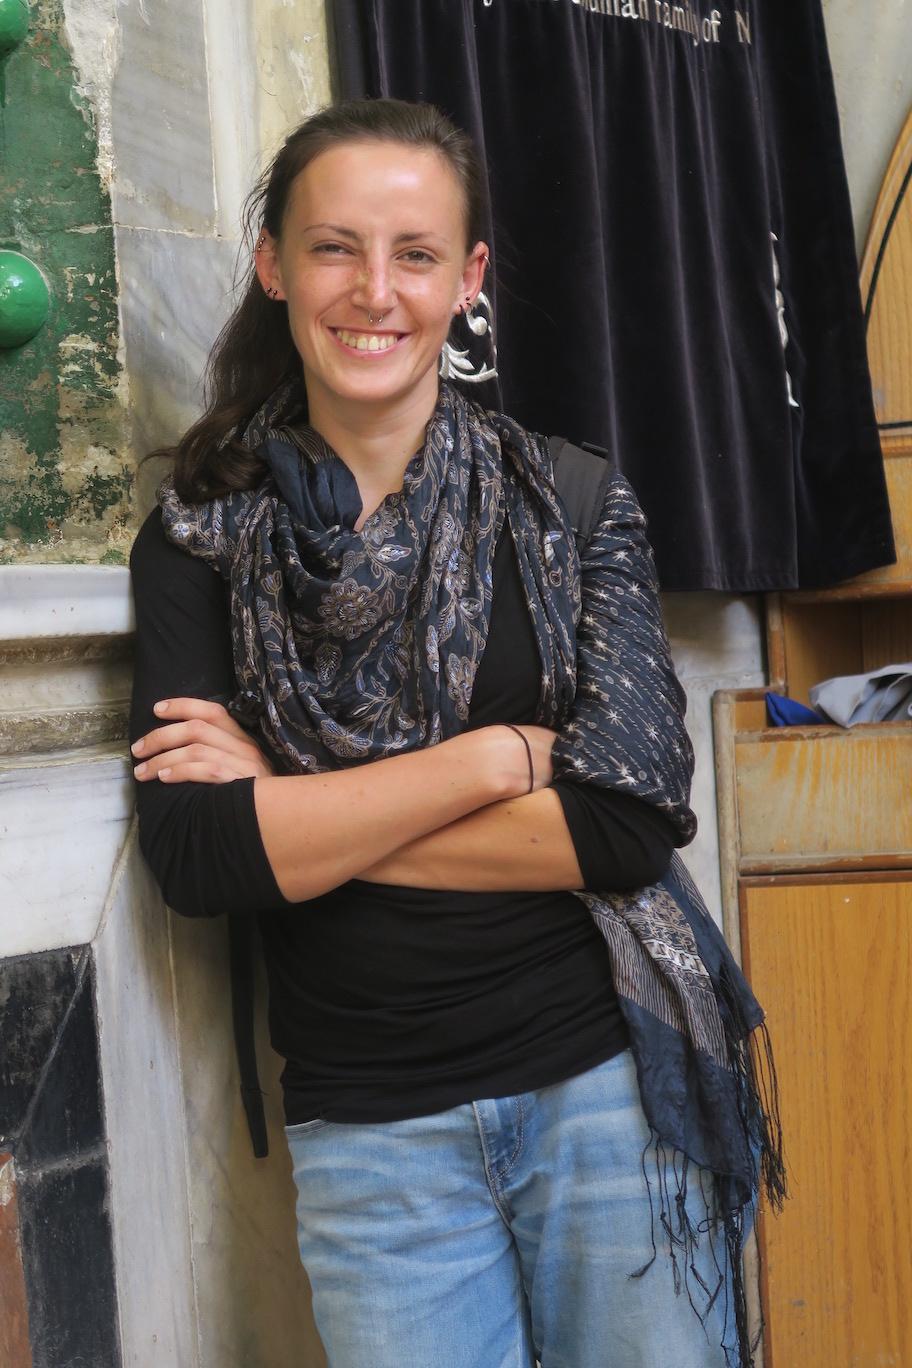 Livia Perosino